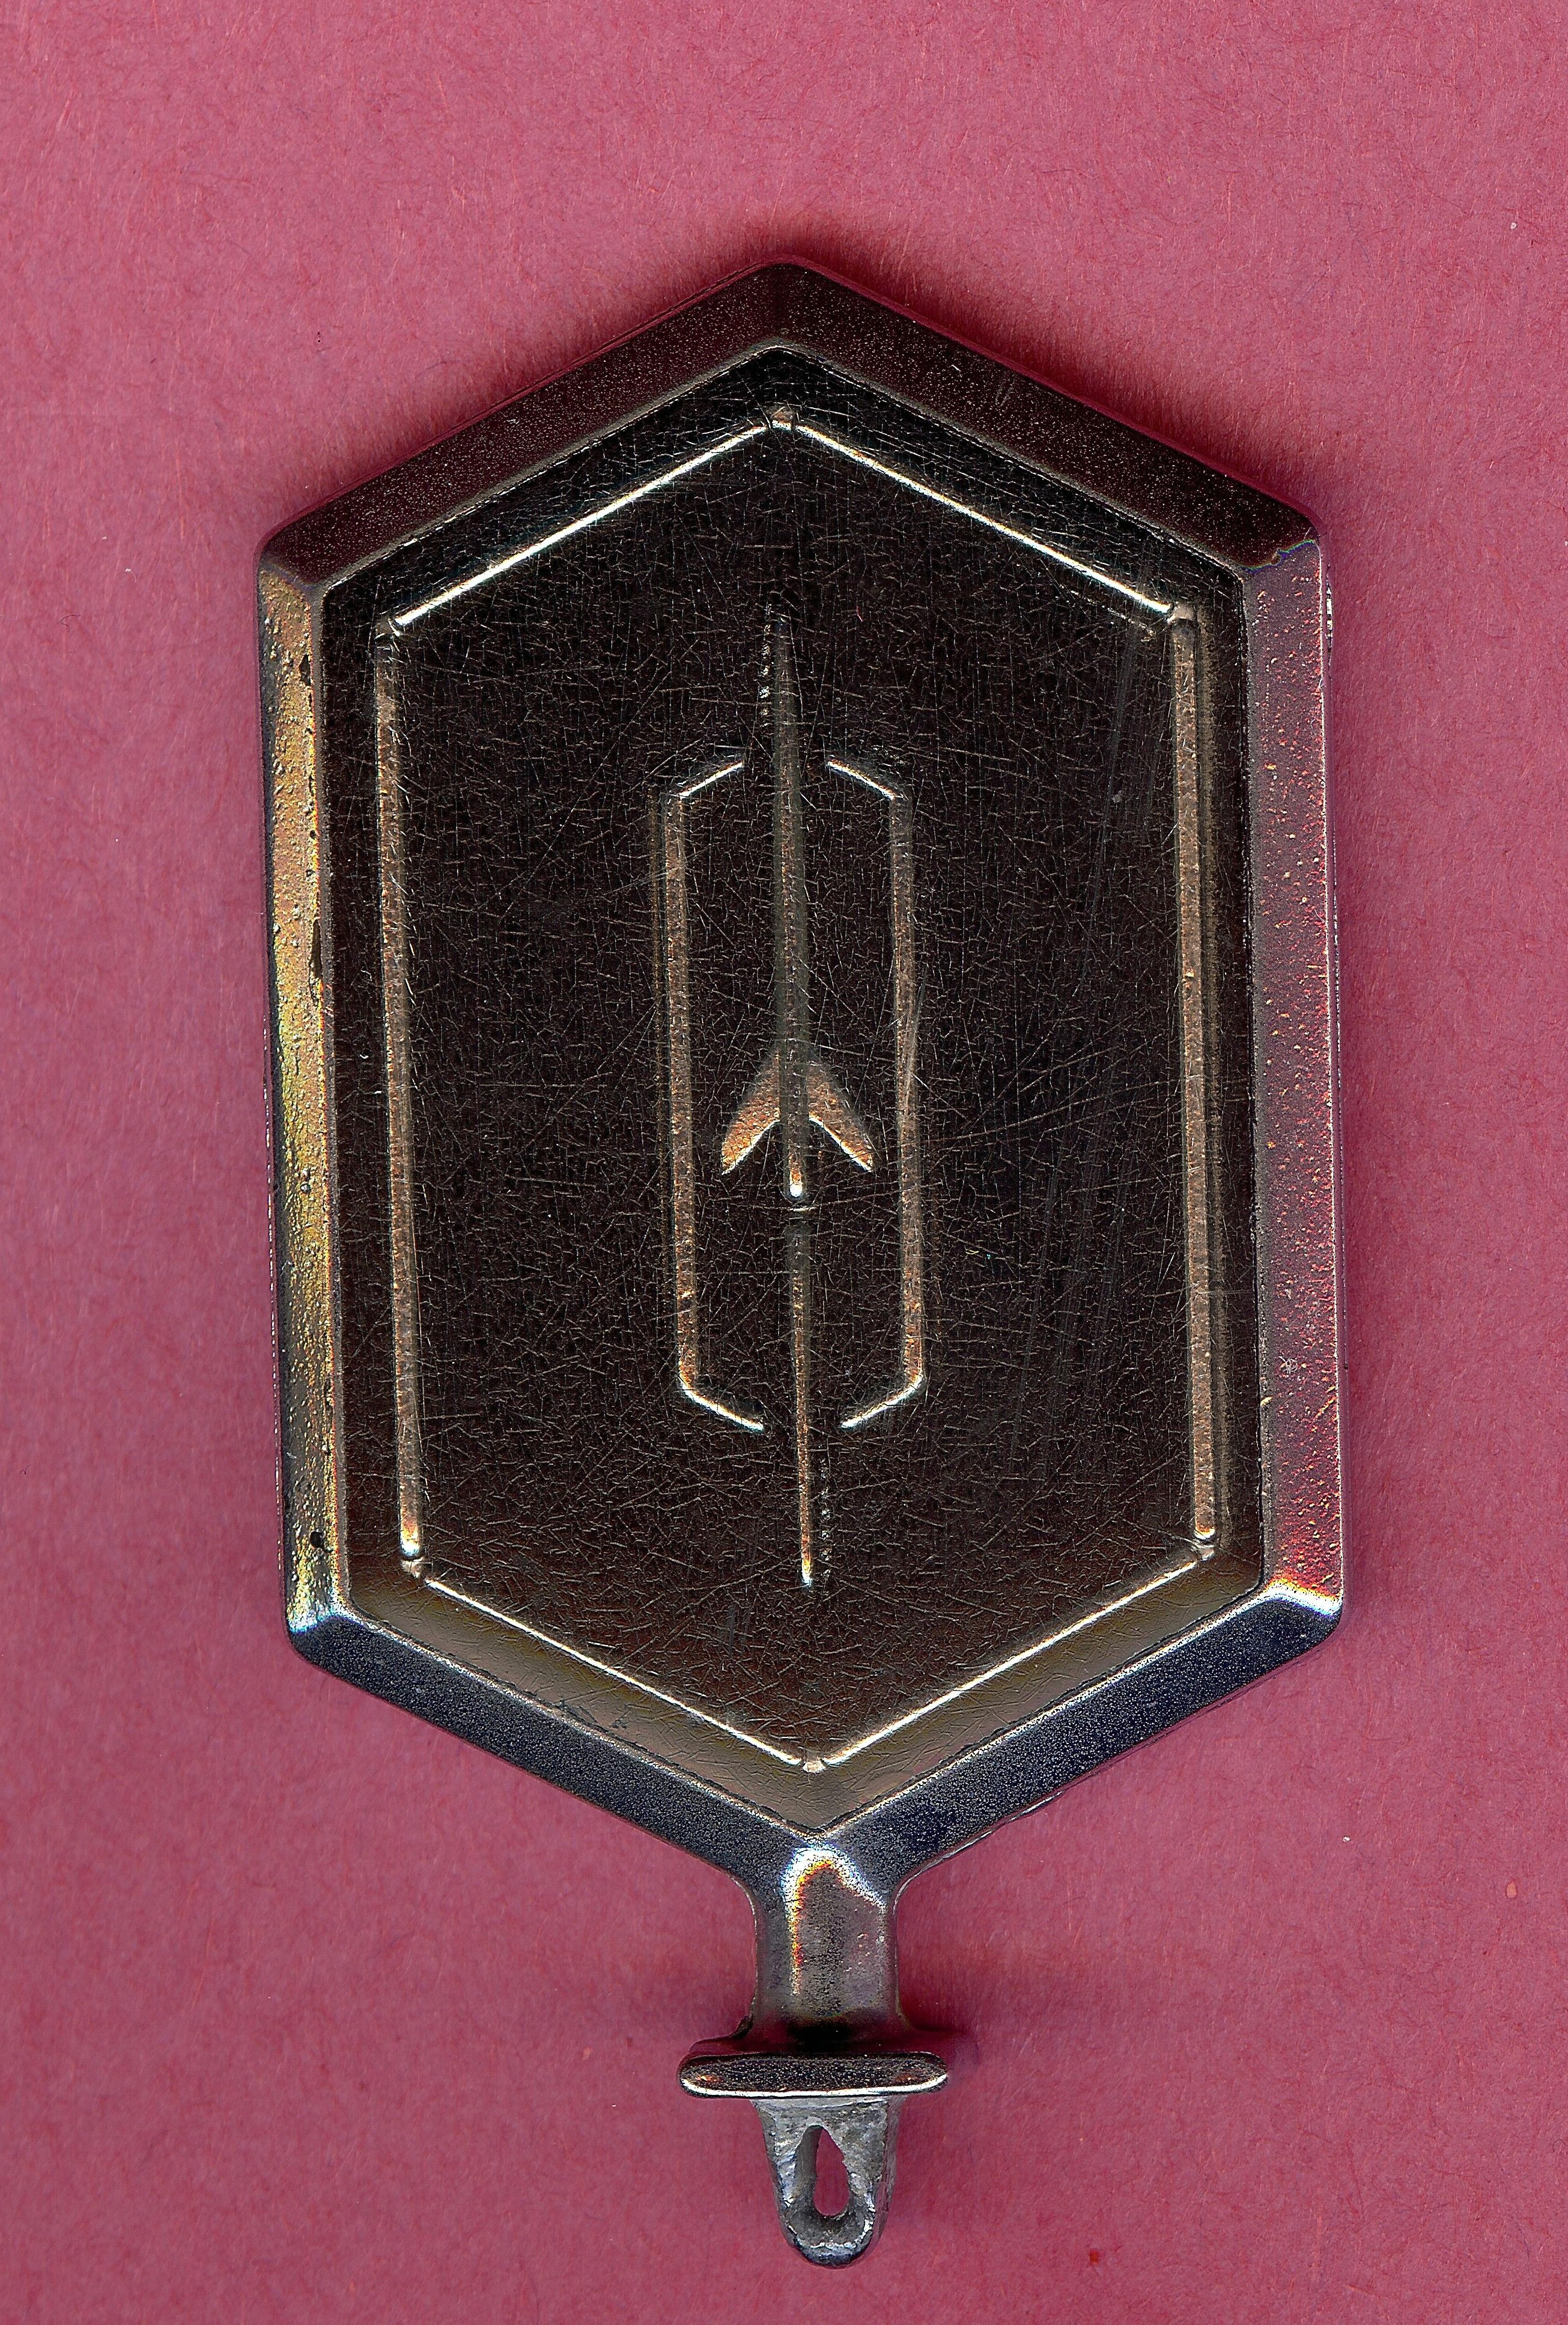 Maudie's Emblem